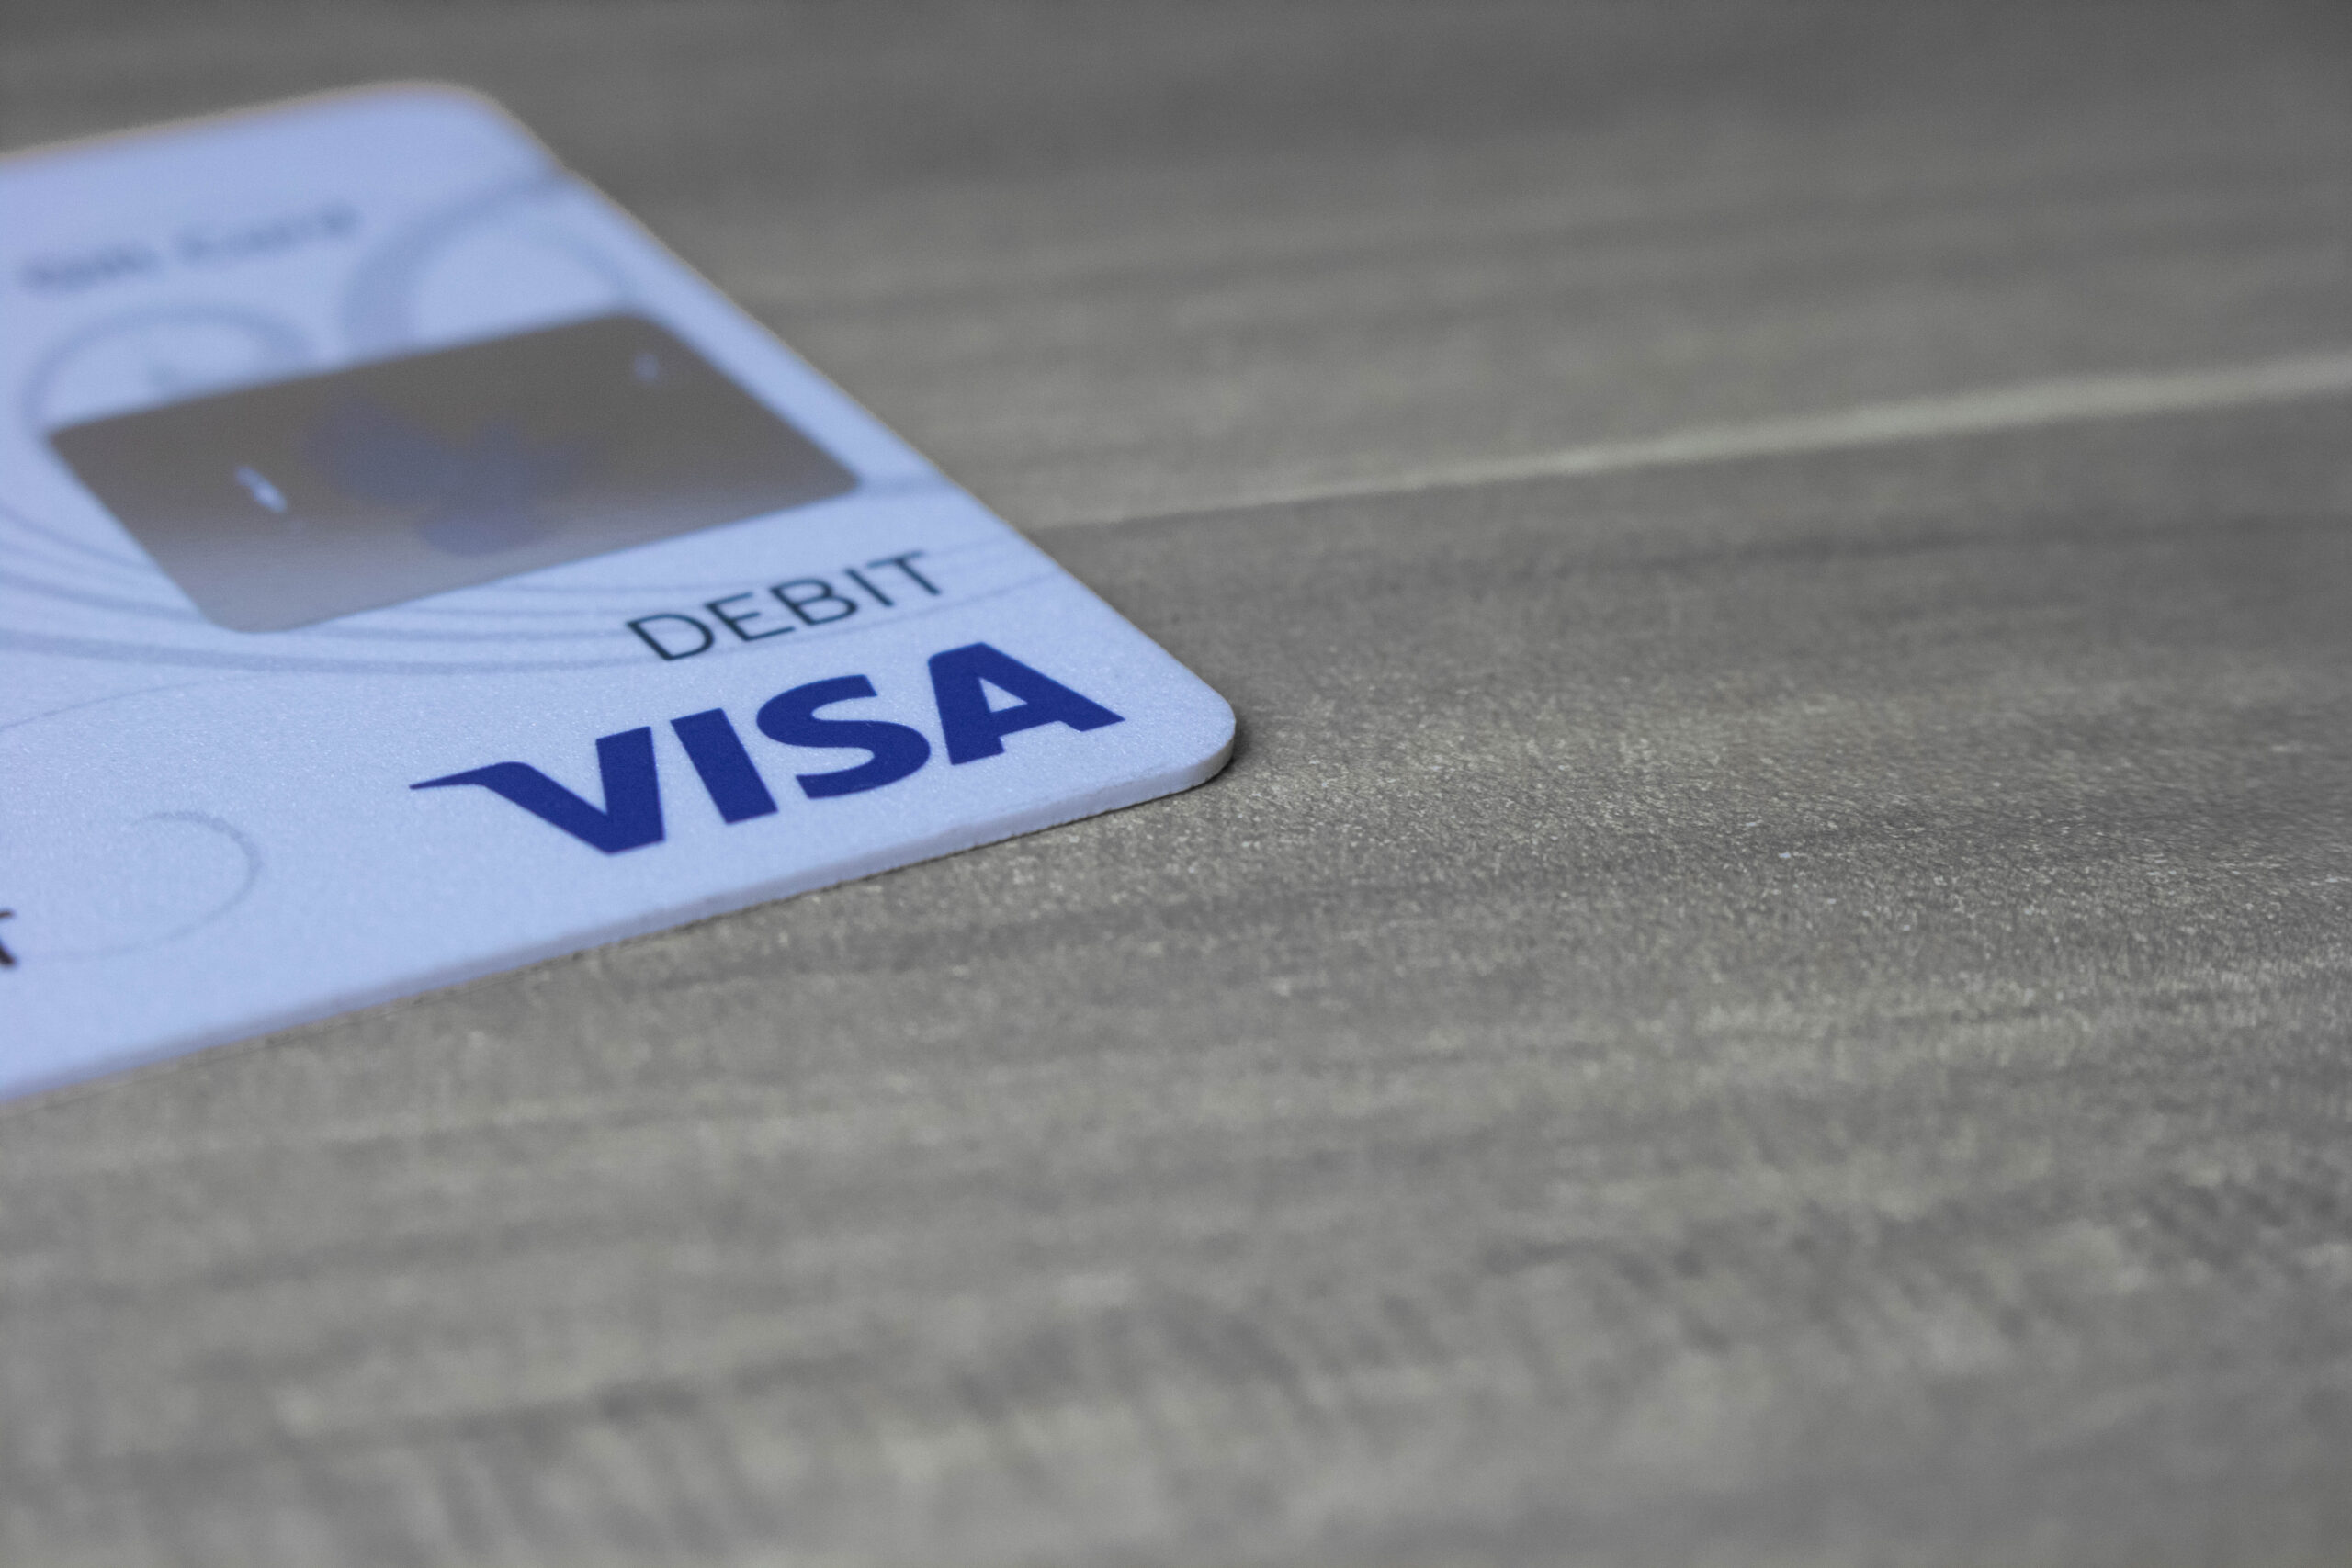 Payment Credit Card Resting on Desk